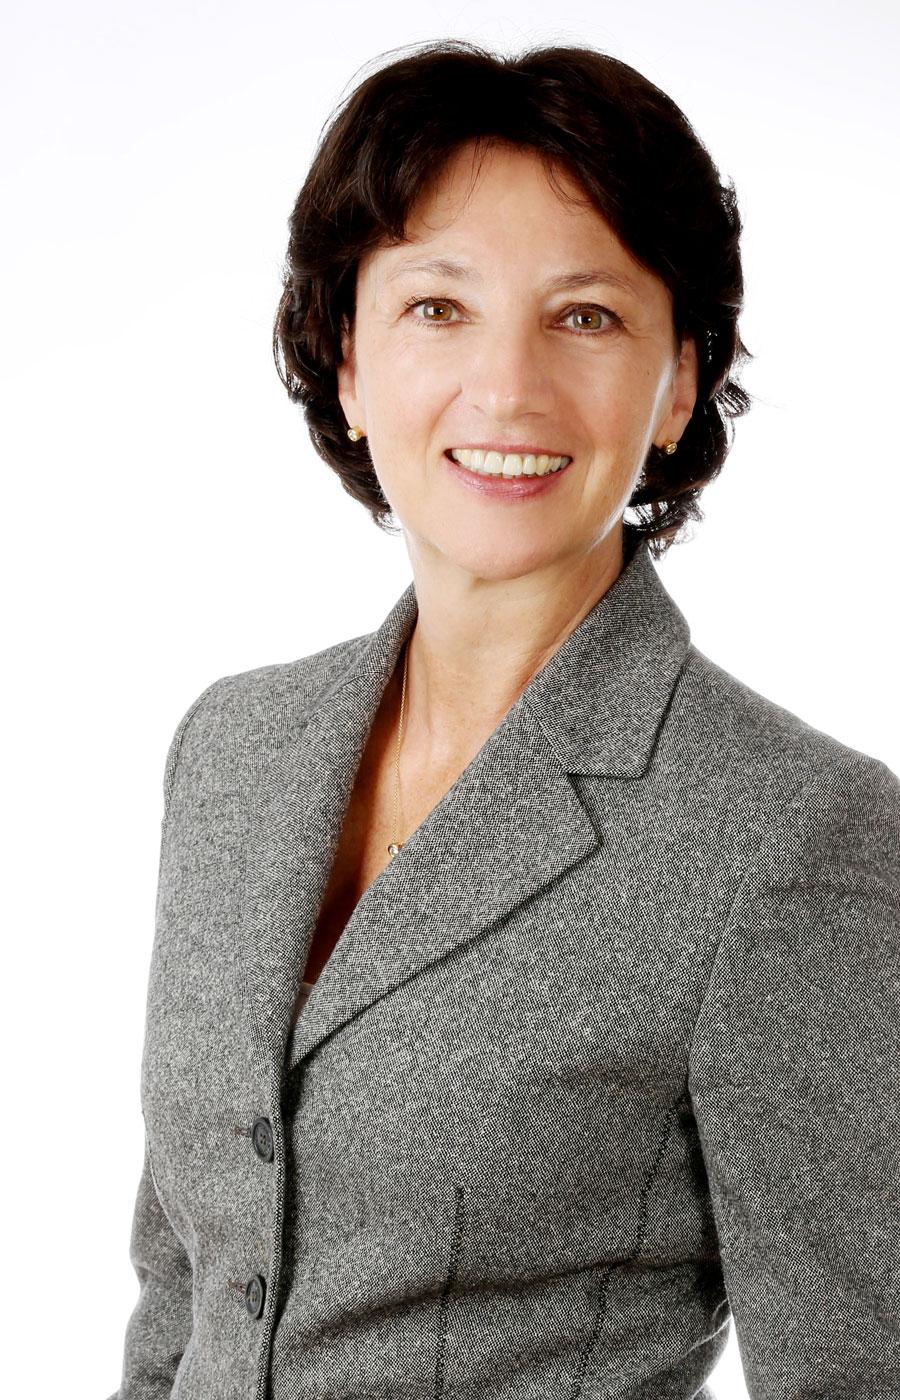 Claudia Engels von engels-uebersetzungen.de